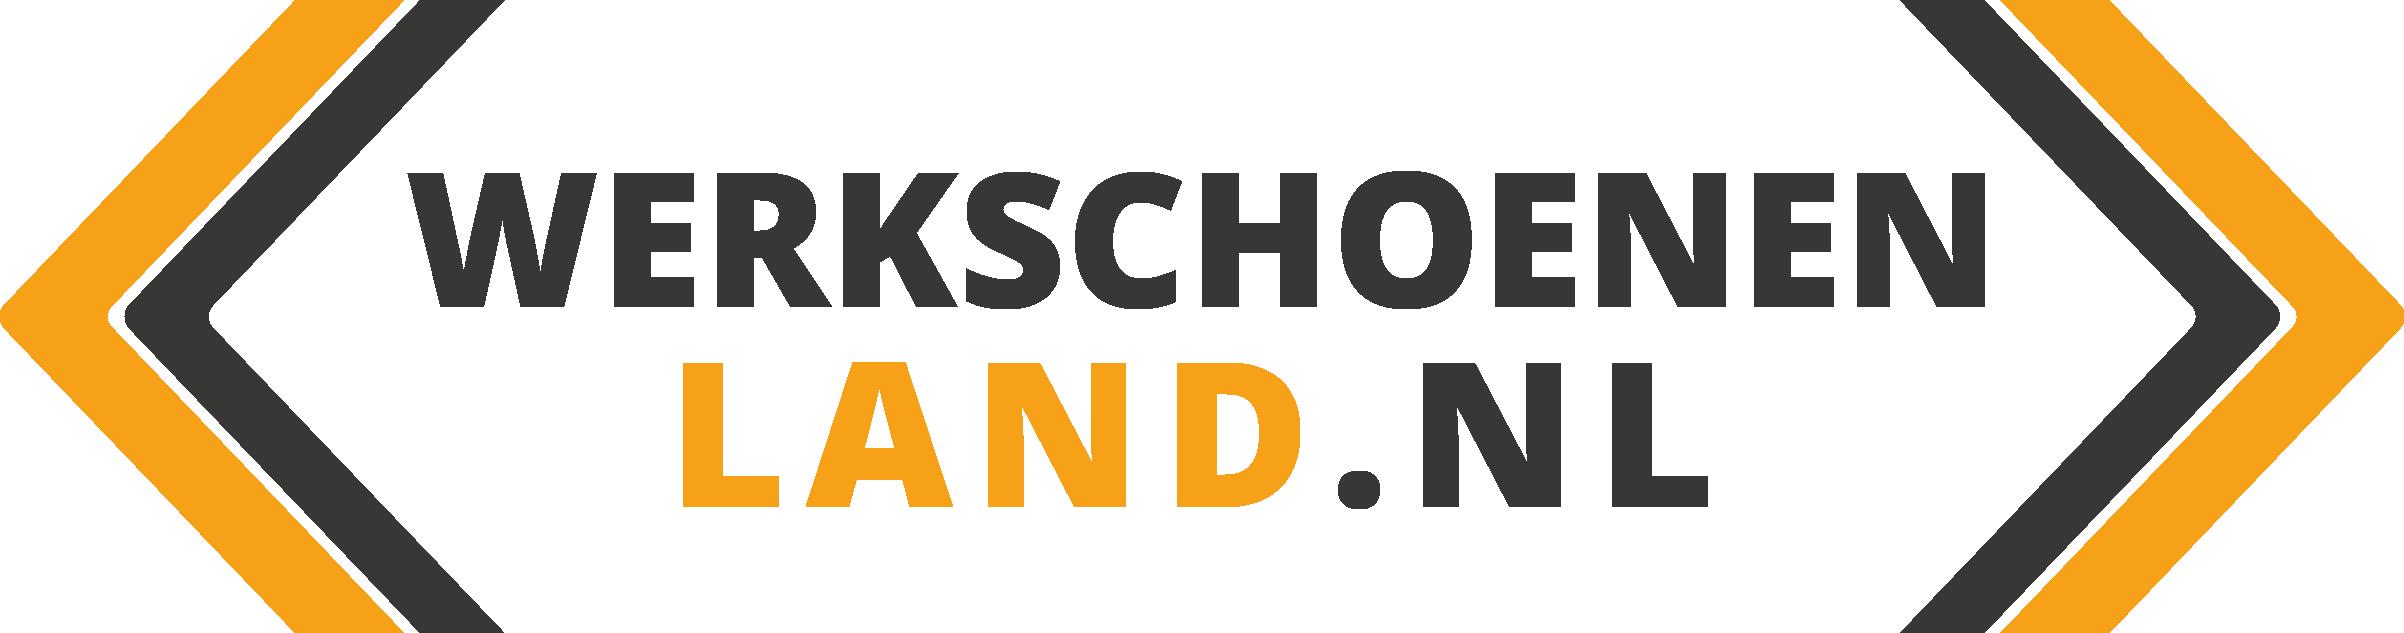 Werkschoenenland.nl